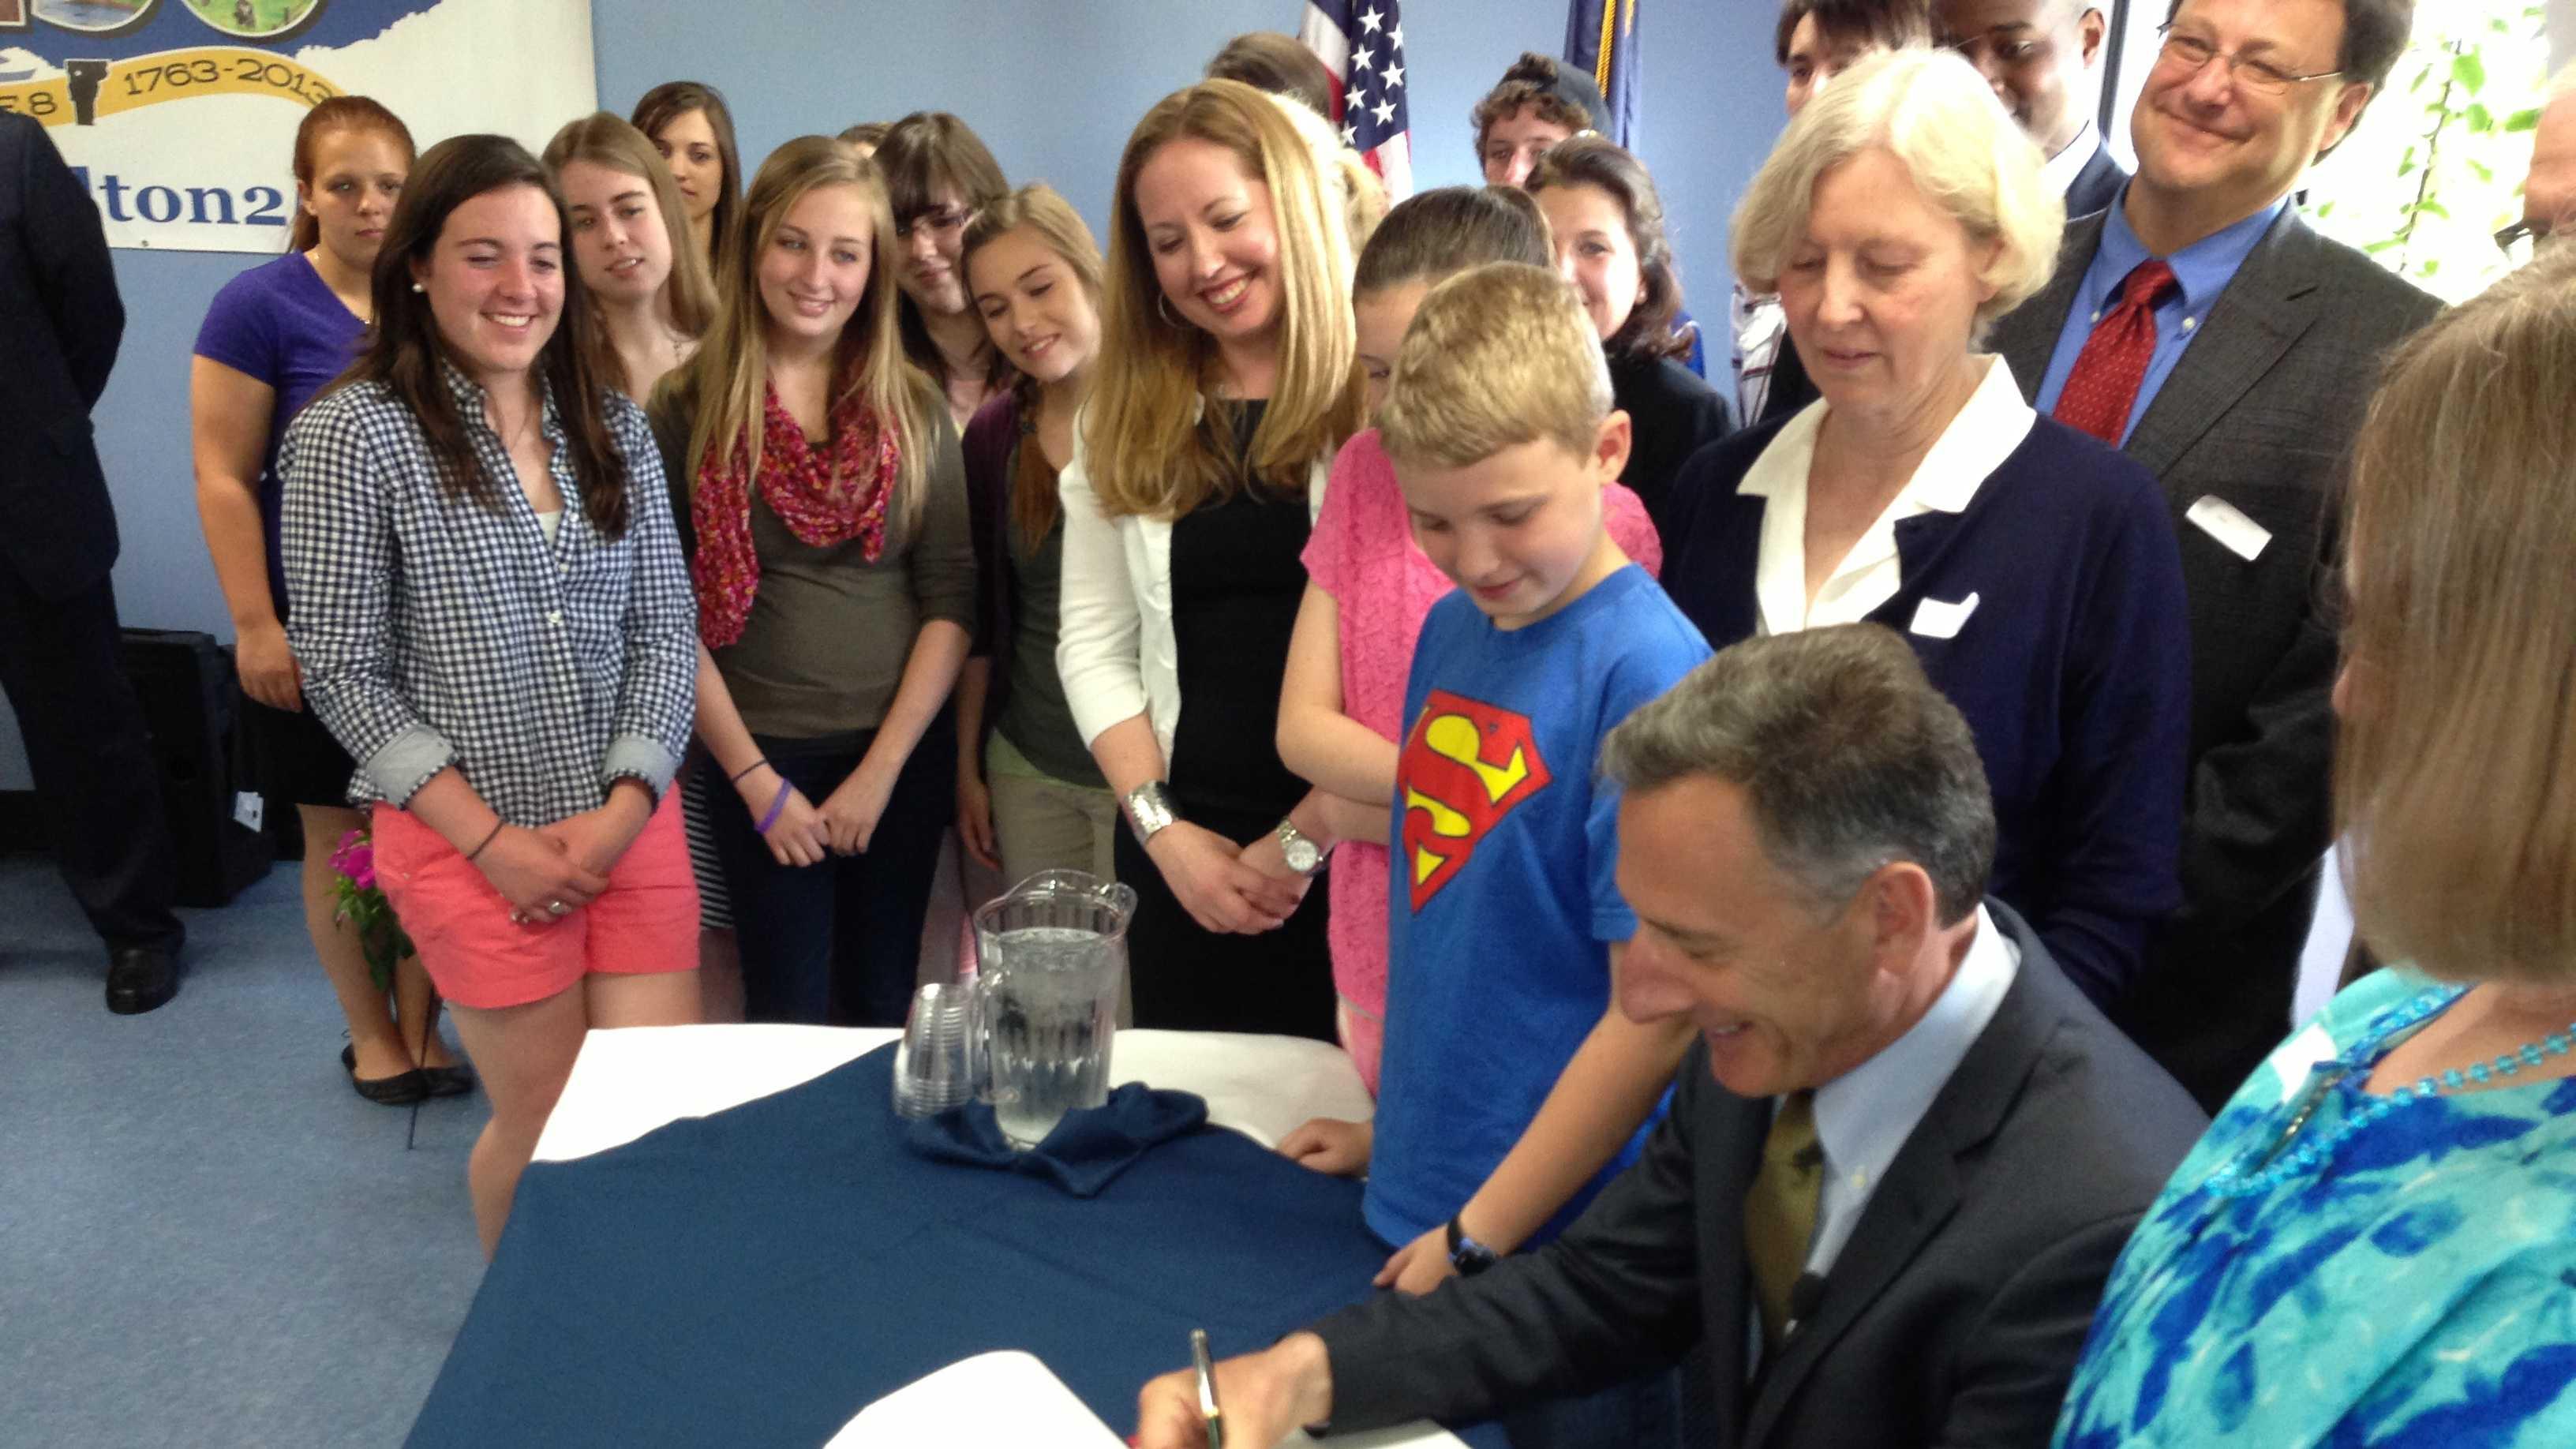 05-28-13 Shumlin signs new budget - img